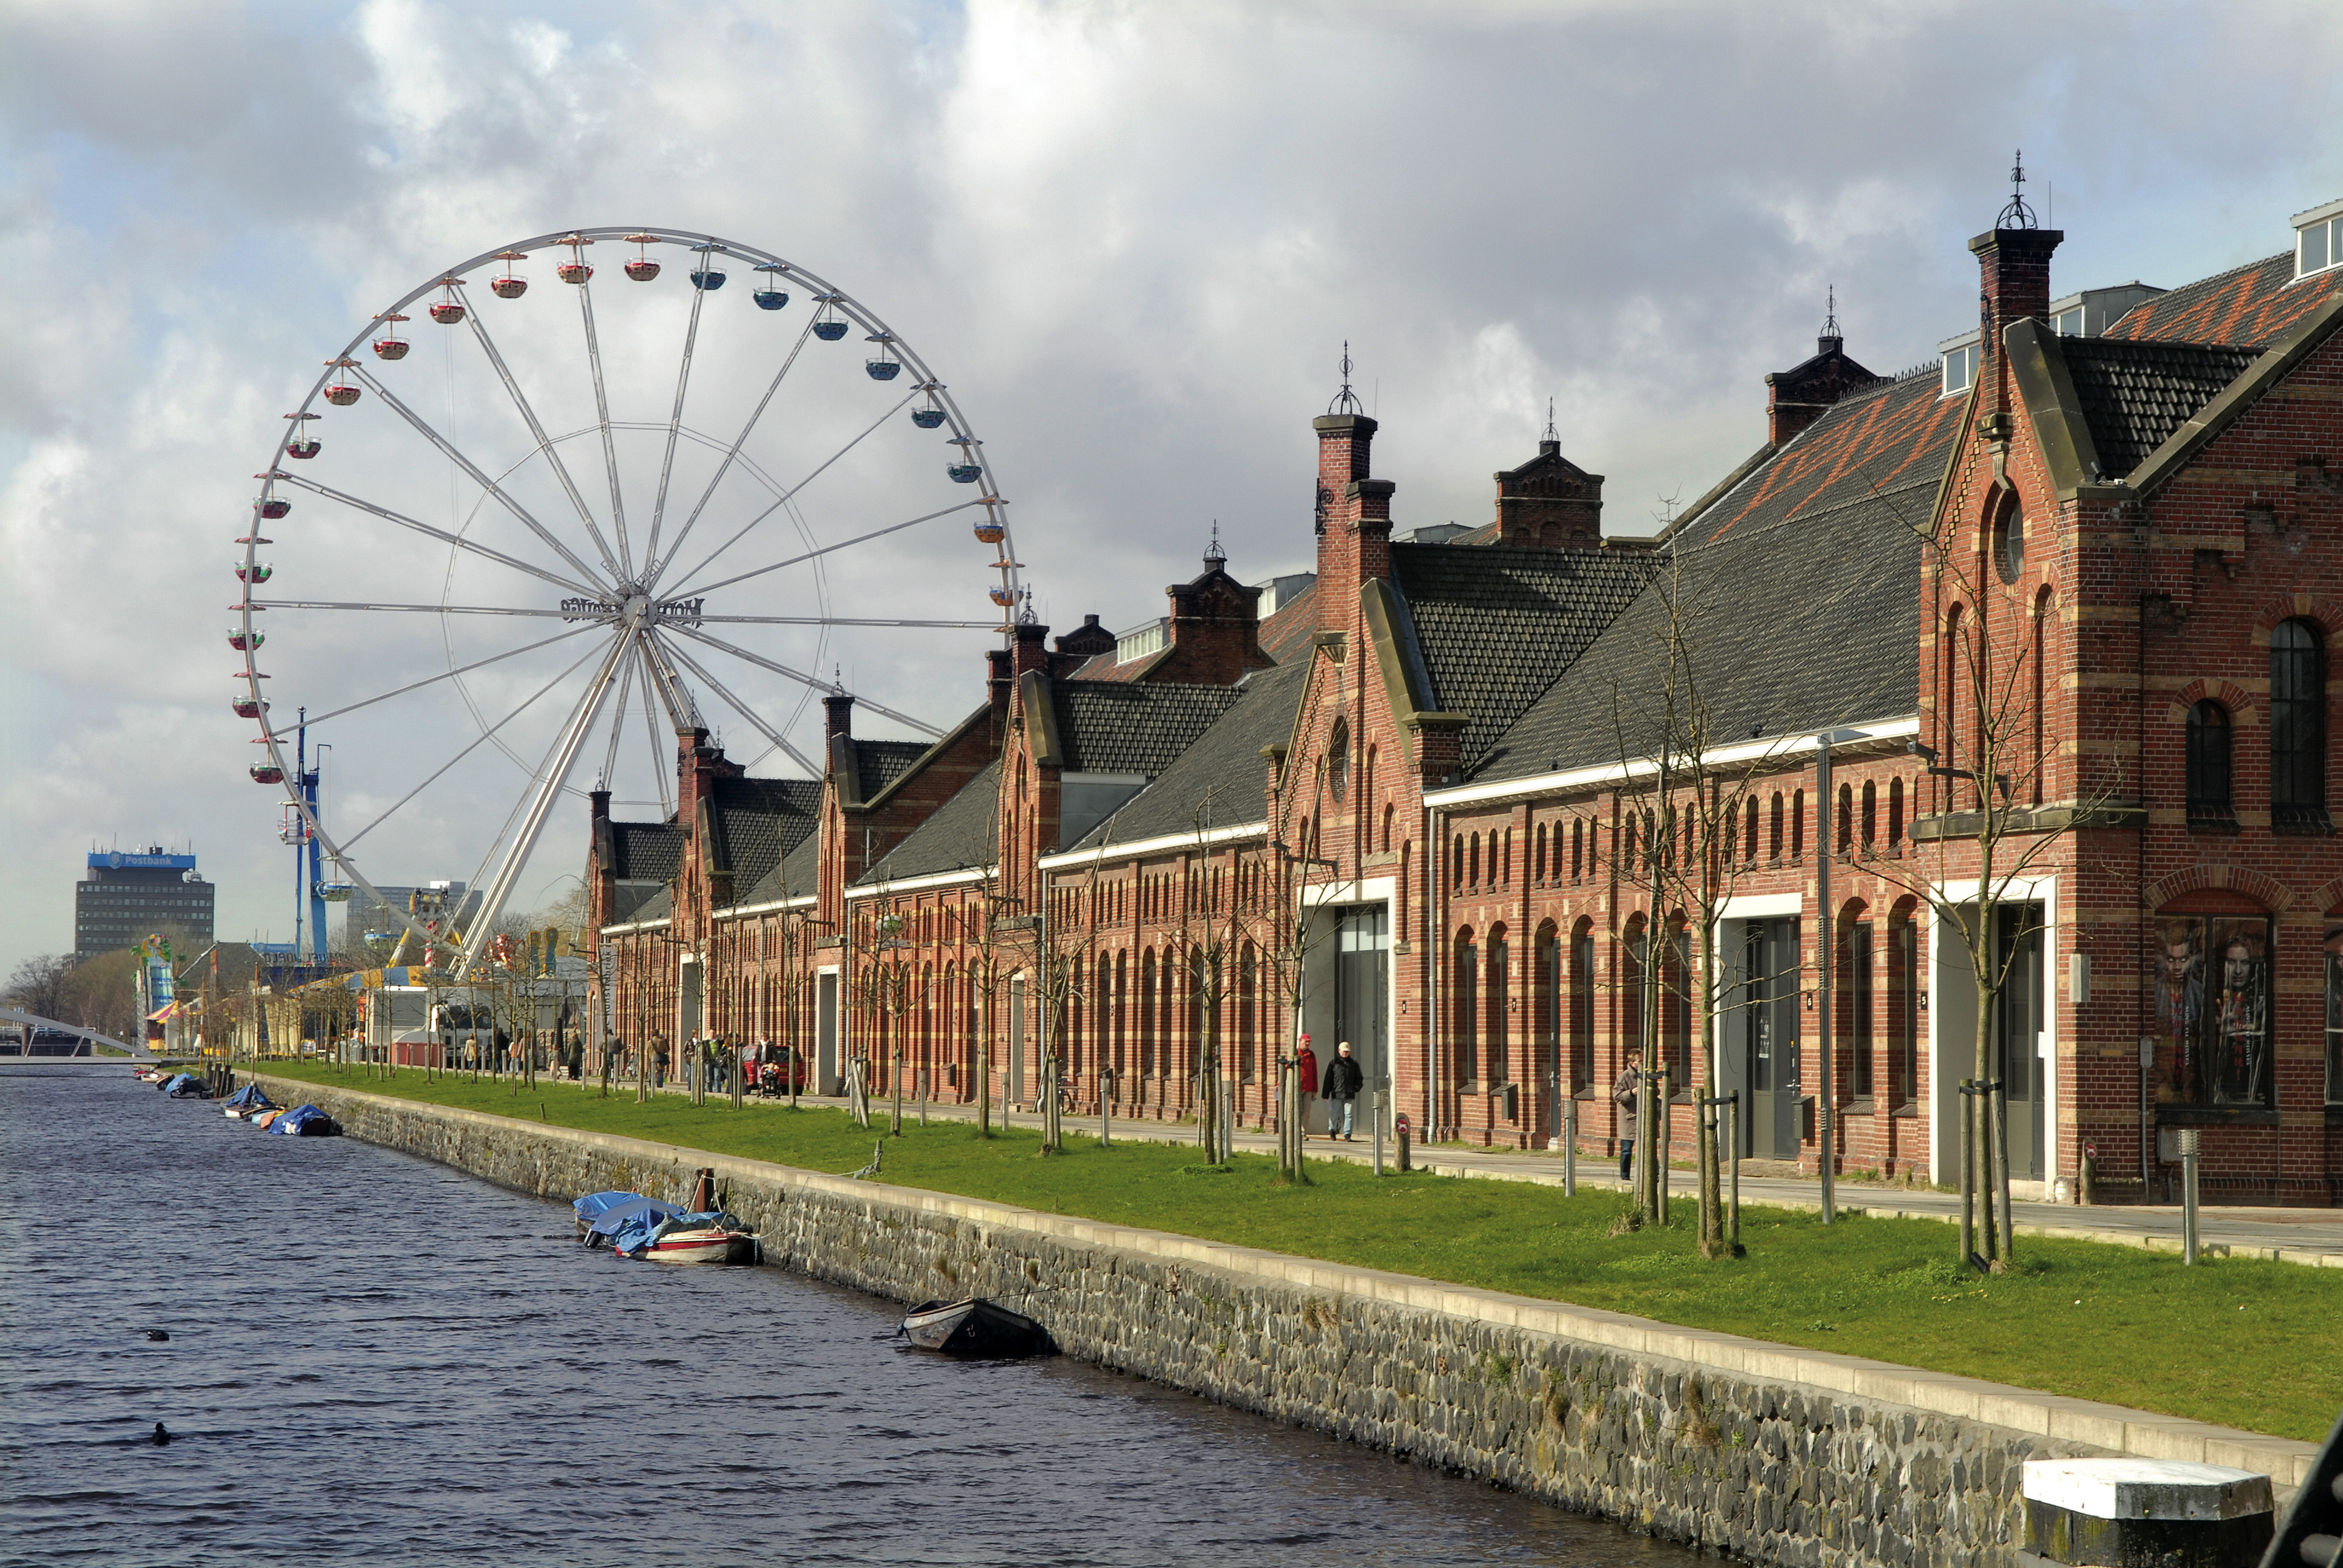 Westergasfabriek Amsterdam VvE Beurs